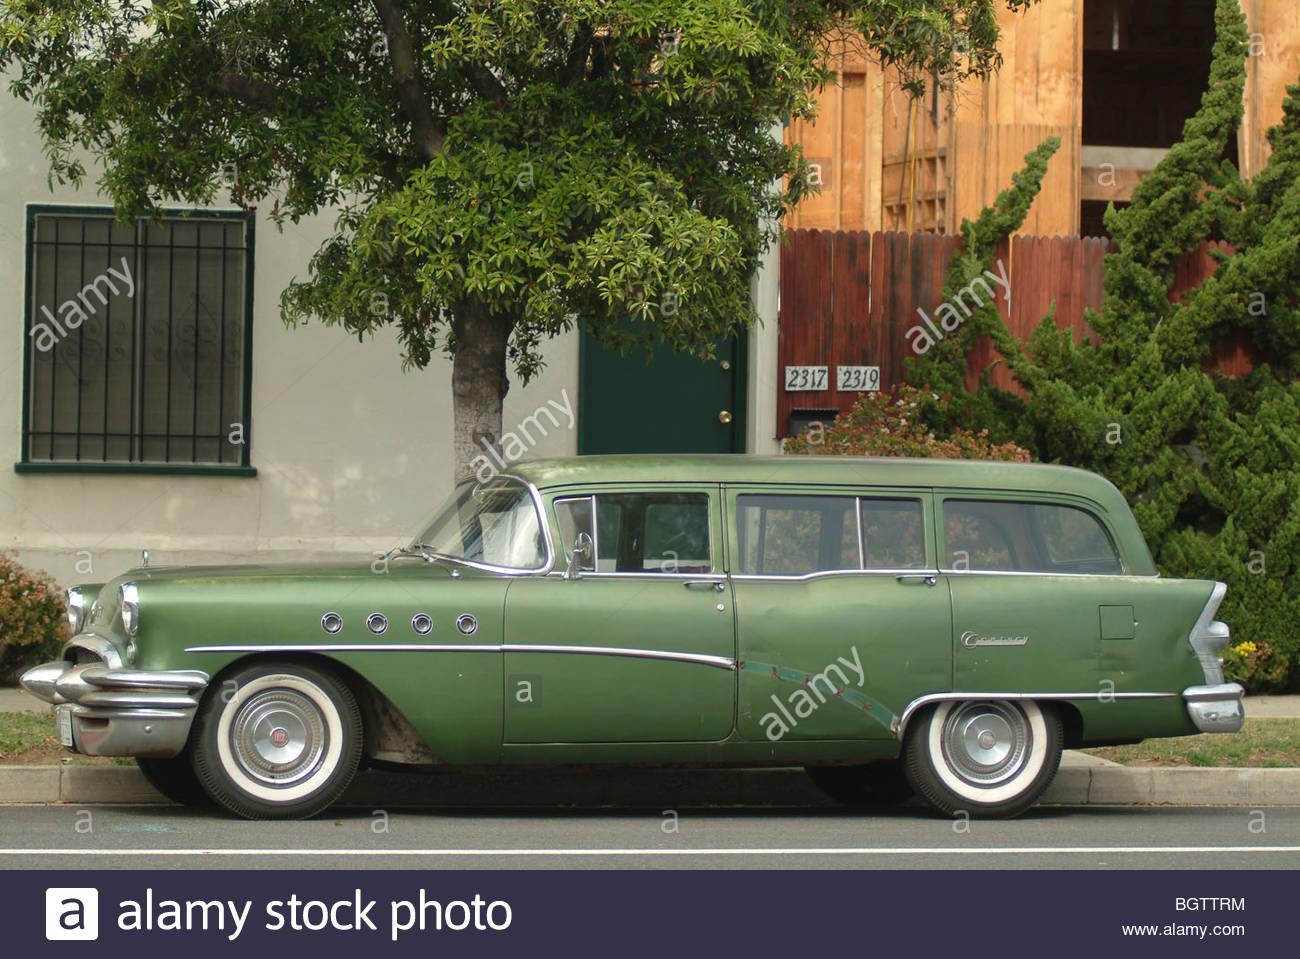 Buy Classic American Cars Uk